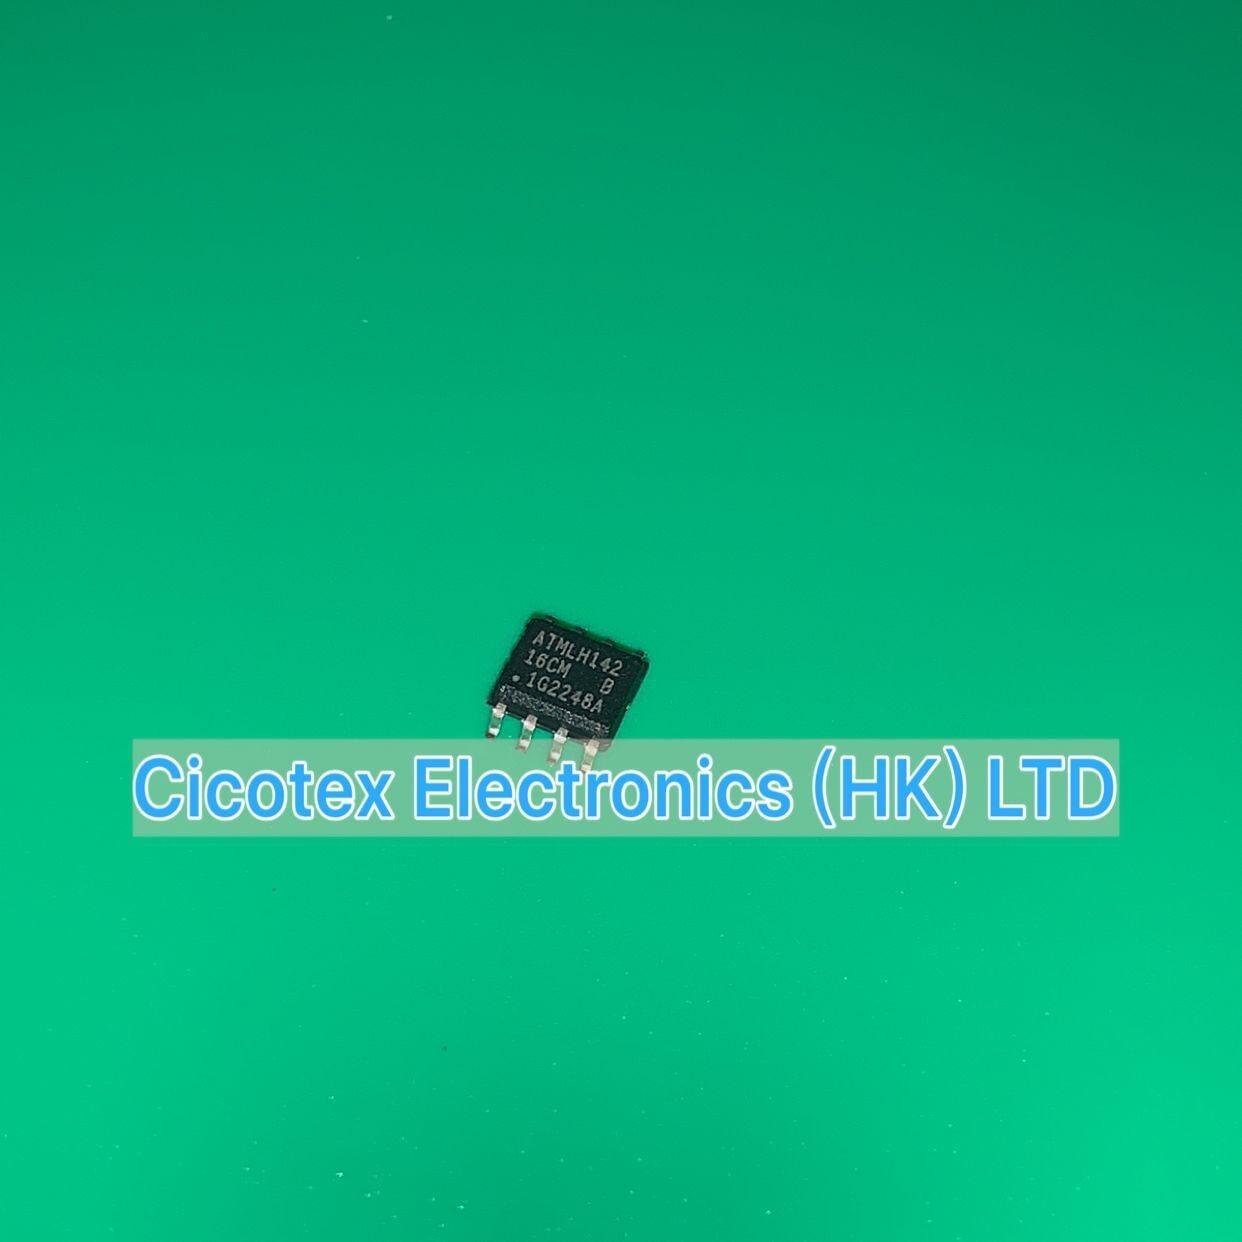 20 unids/lote AT24C16C-SSHM-T SOP8 ATMLH 16CM AT24C16 C-SSHM-T IC EEPROM 16K I2C 1MHZ, SOIC 8 AT24C16CSSHMT AT24C16C-SSHM-B AT24C16C